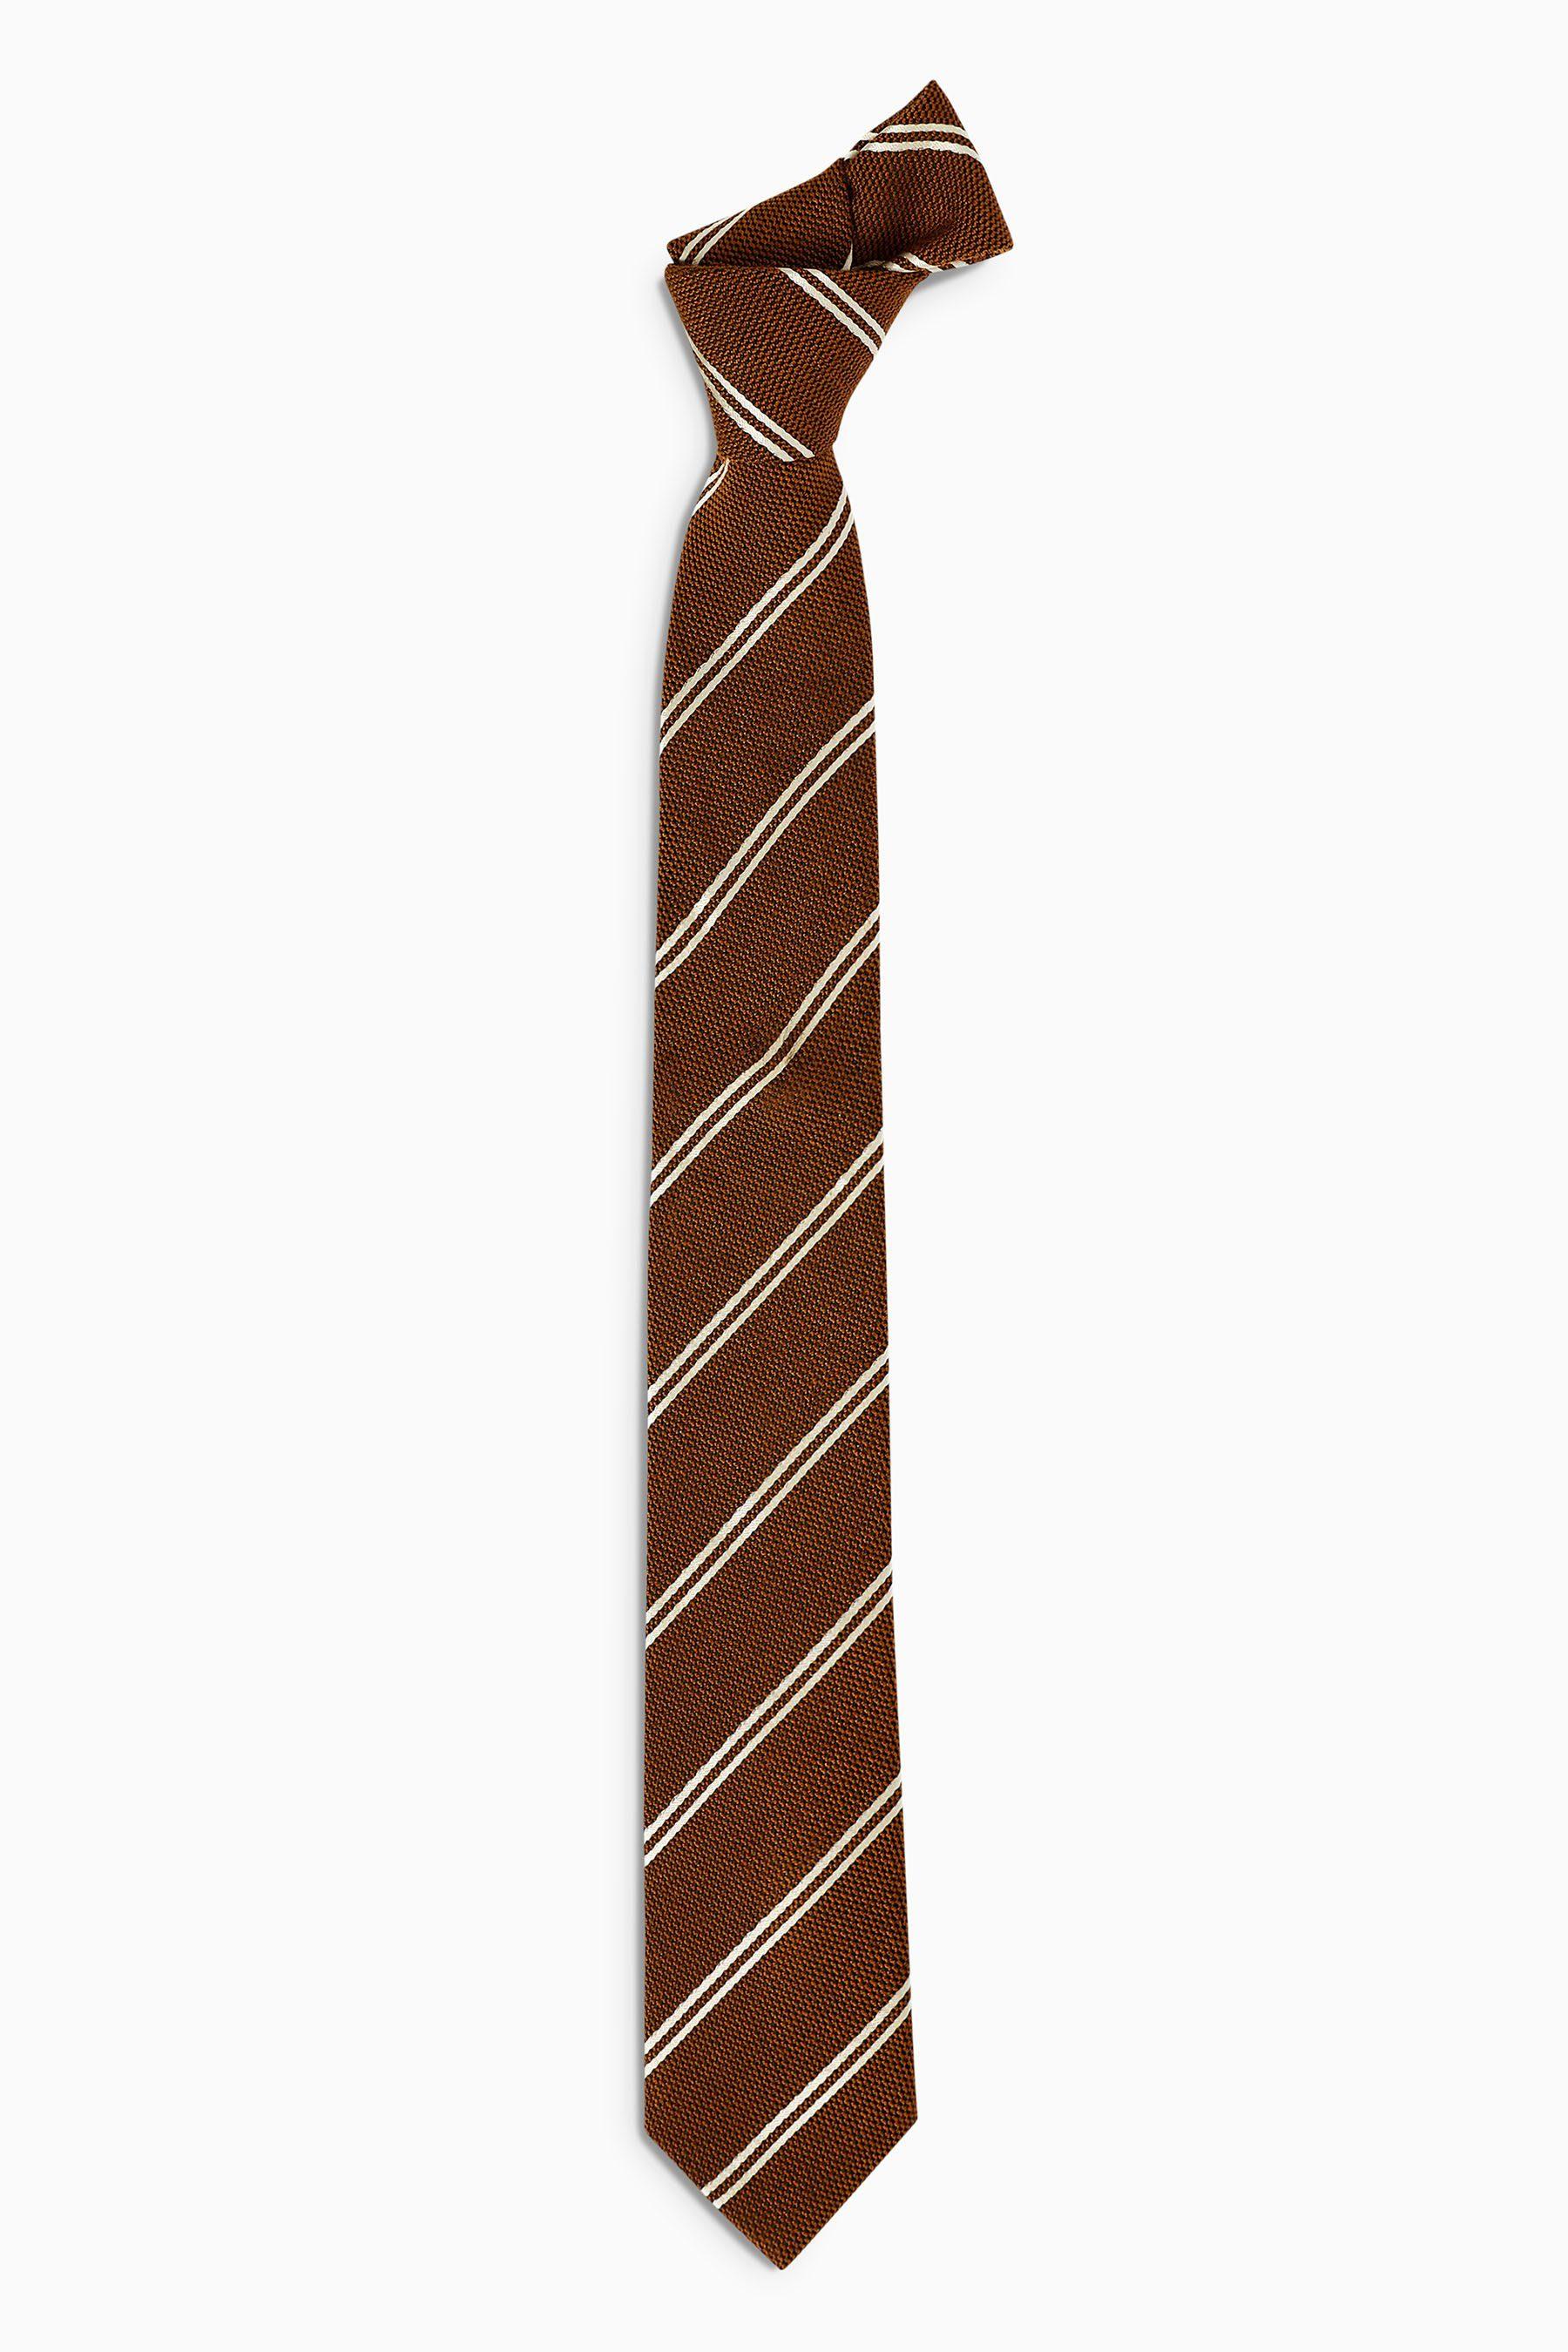 Next Gestreifte Krawatte